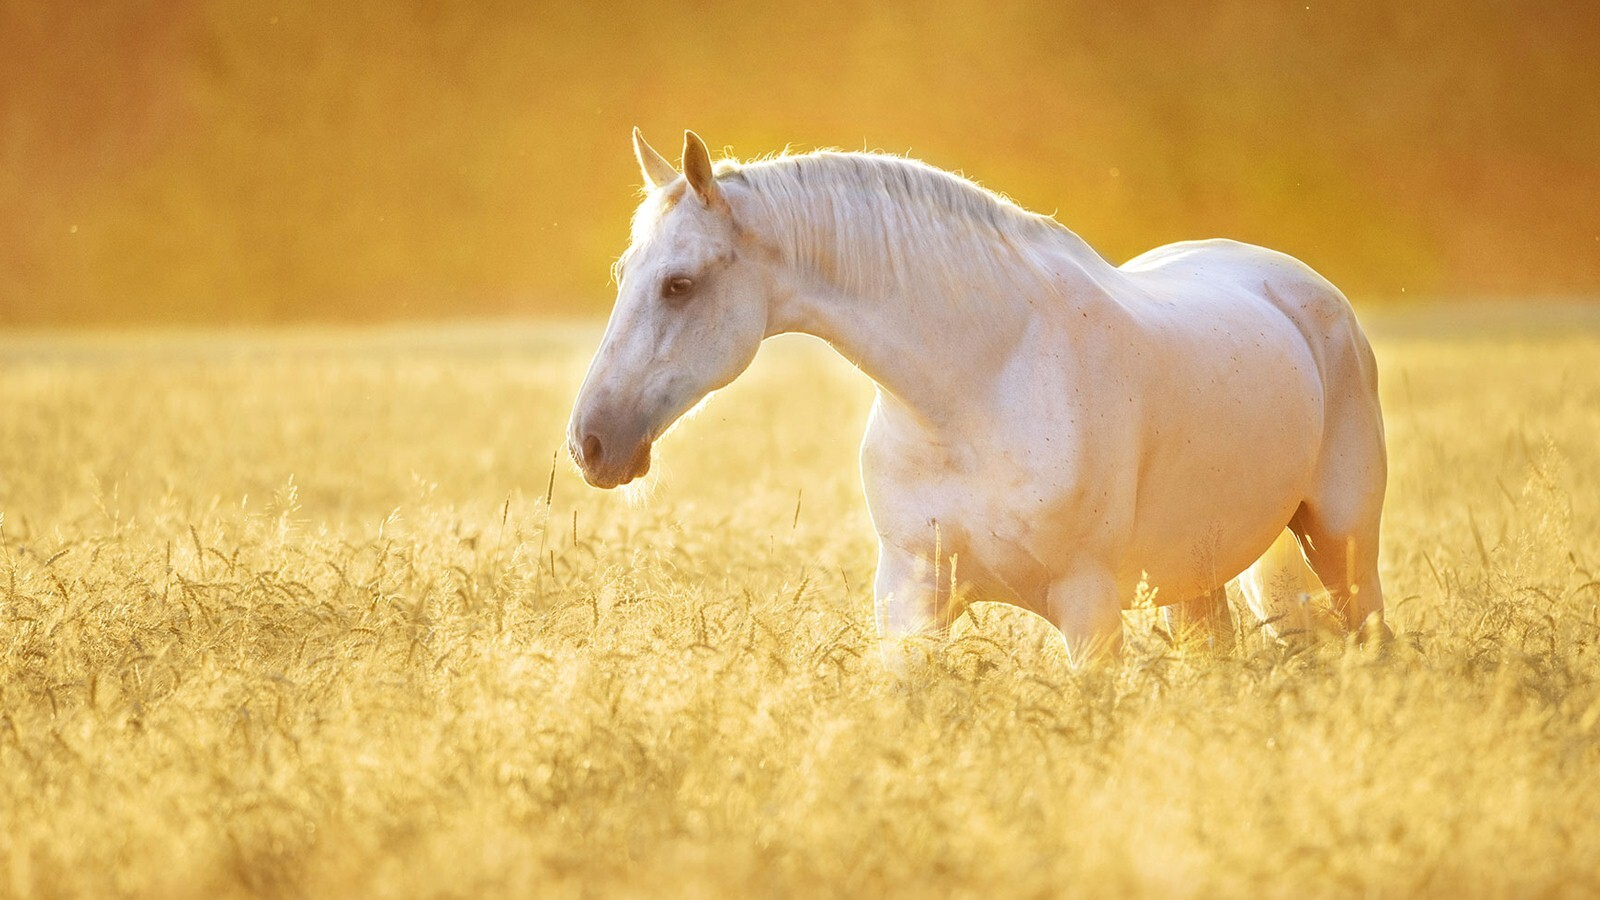 Wallpaper Beautiful White Horses